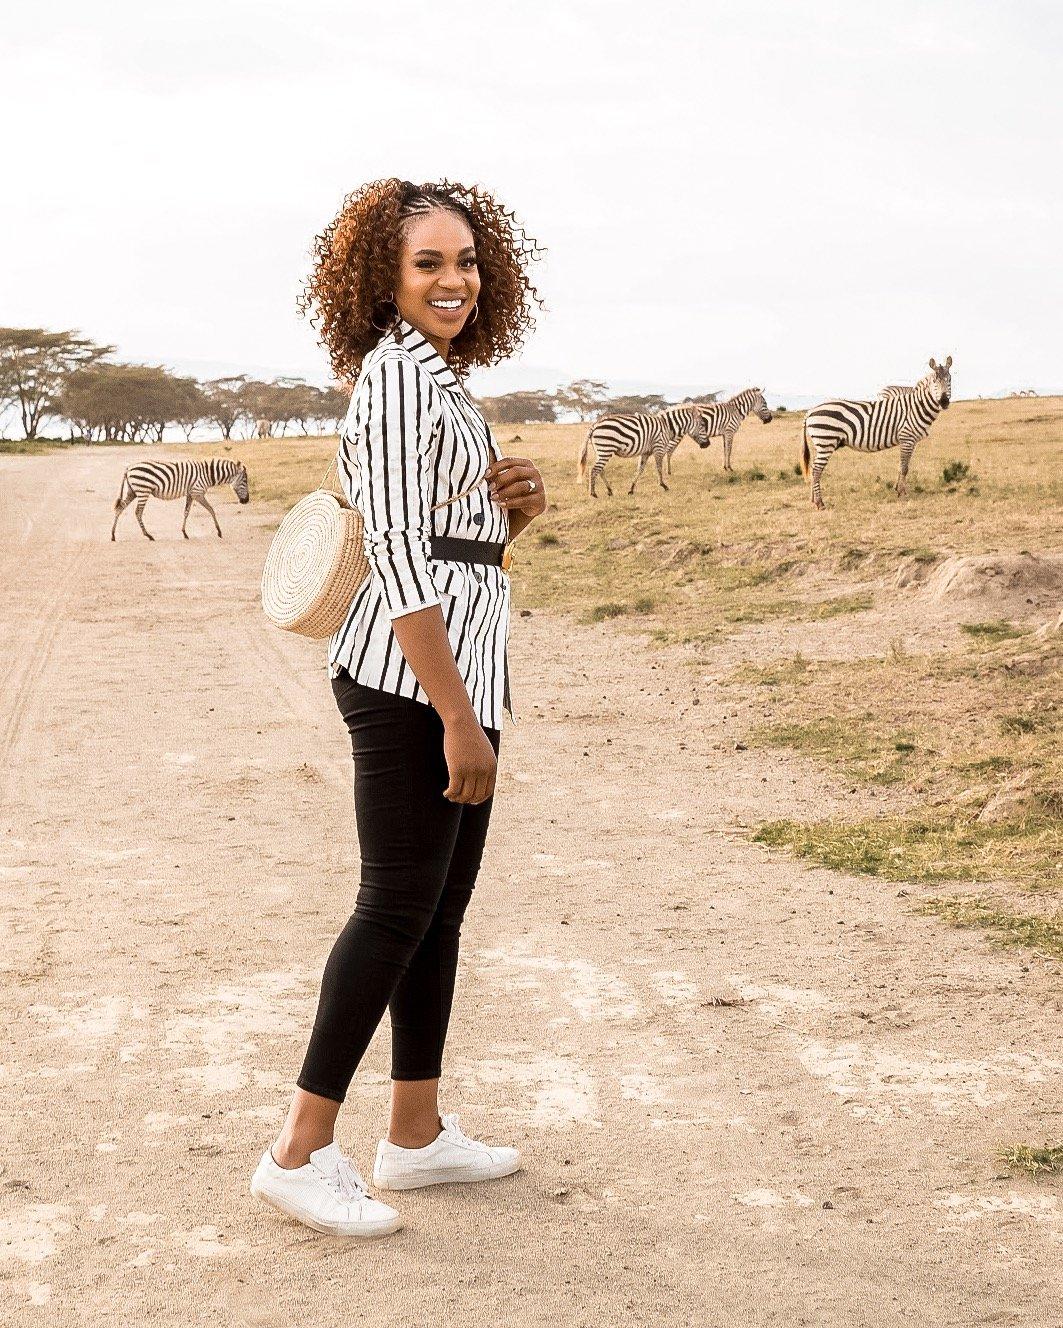 love enin striped blazer, crescent island lake naivasha kenya, zebras, safari photoshoot, photoshoot with zebras, woven circle bag